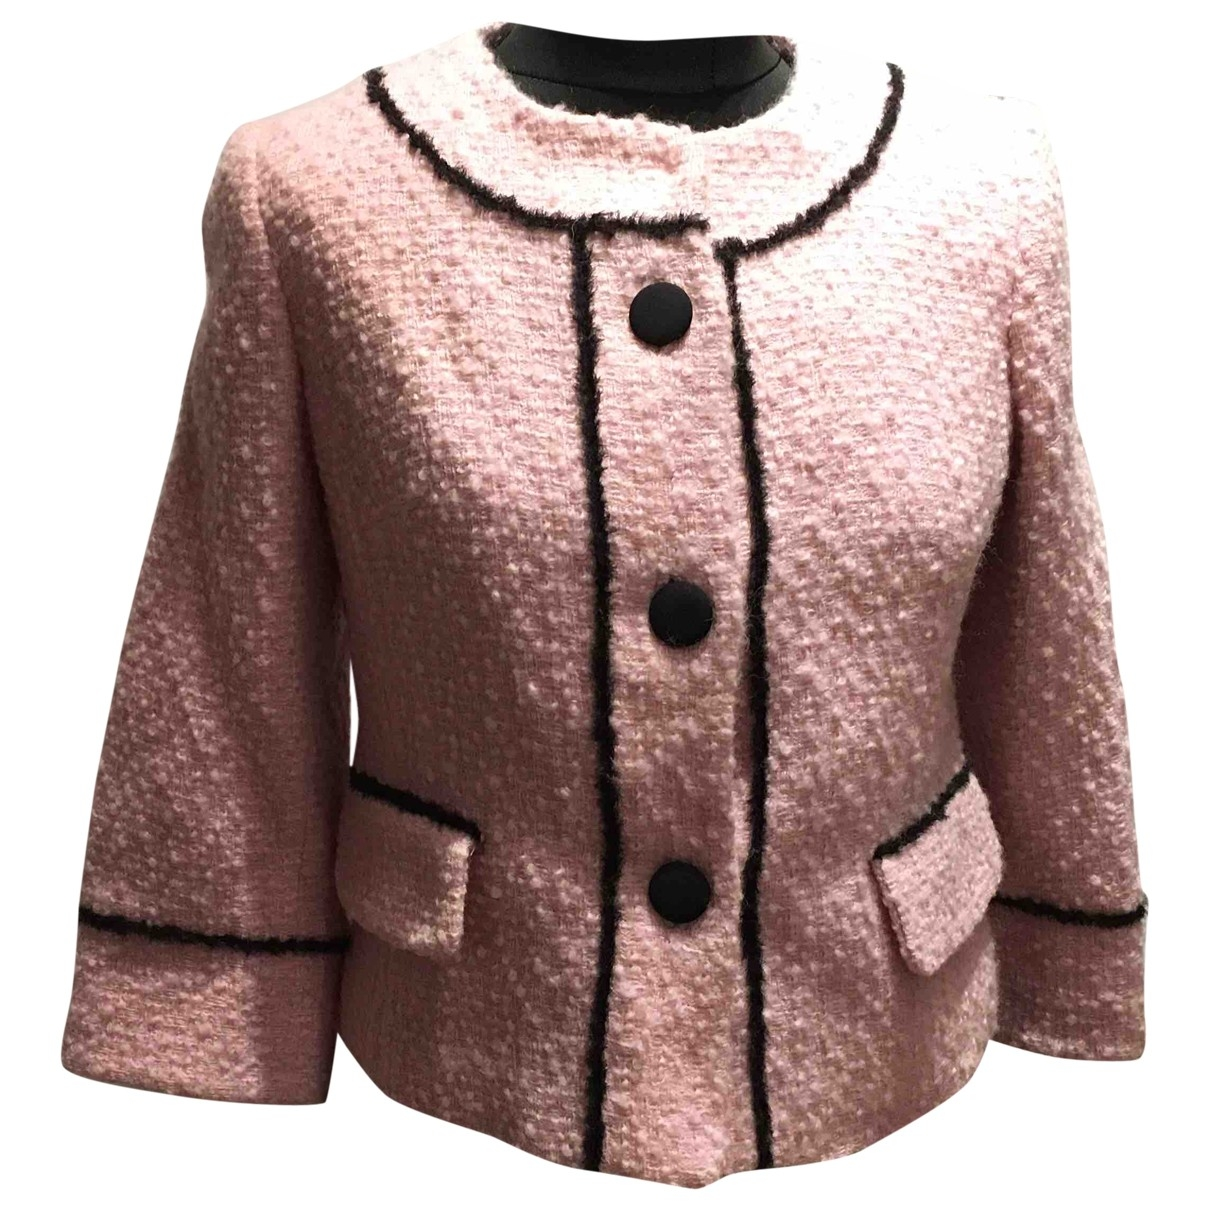 Milly - Veste   pour femme en laine - rose